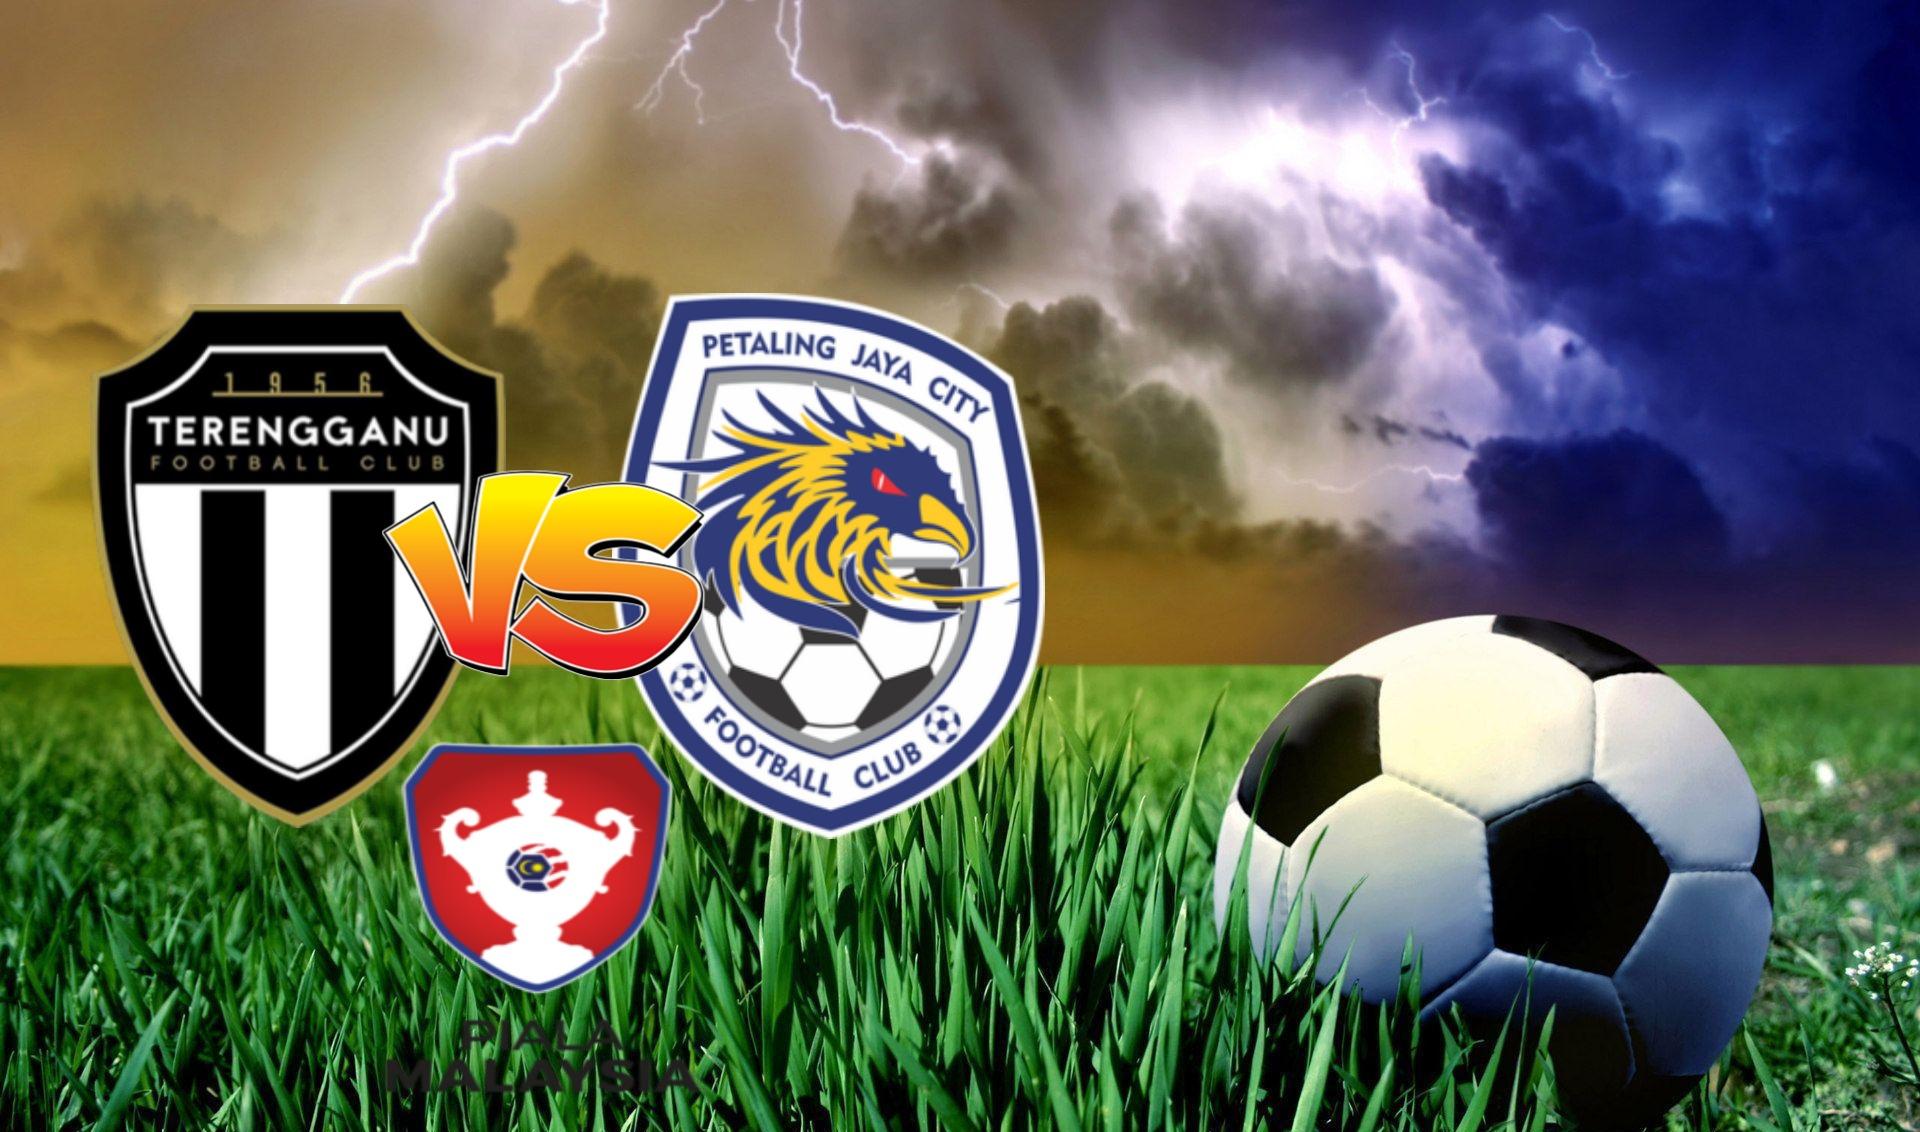 Live Streaming Terengganu vs PJ City FC Piala Malaysia 7.11.2020